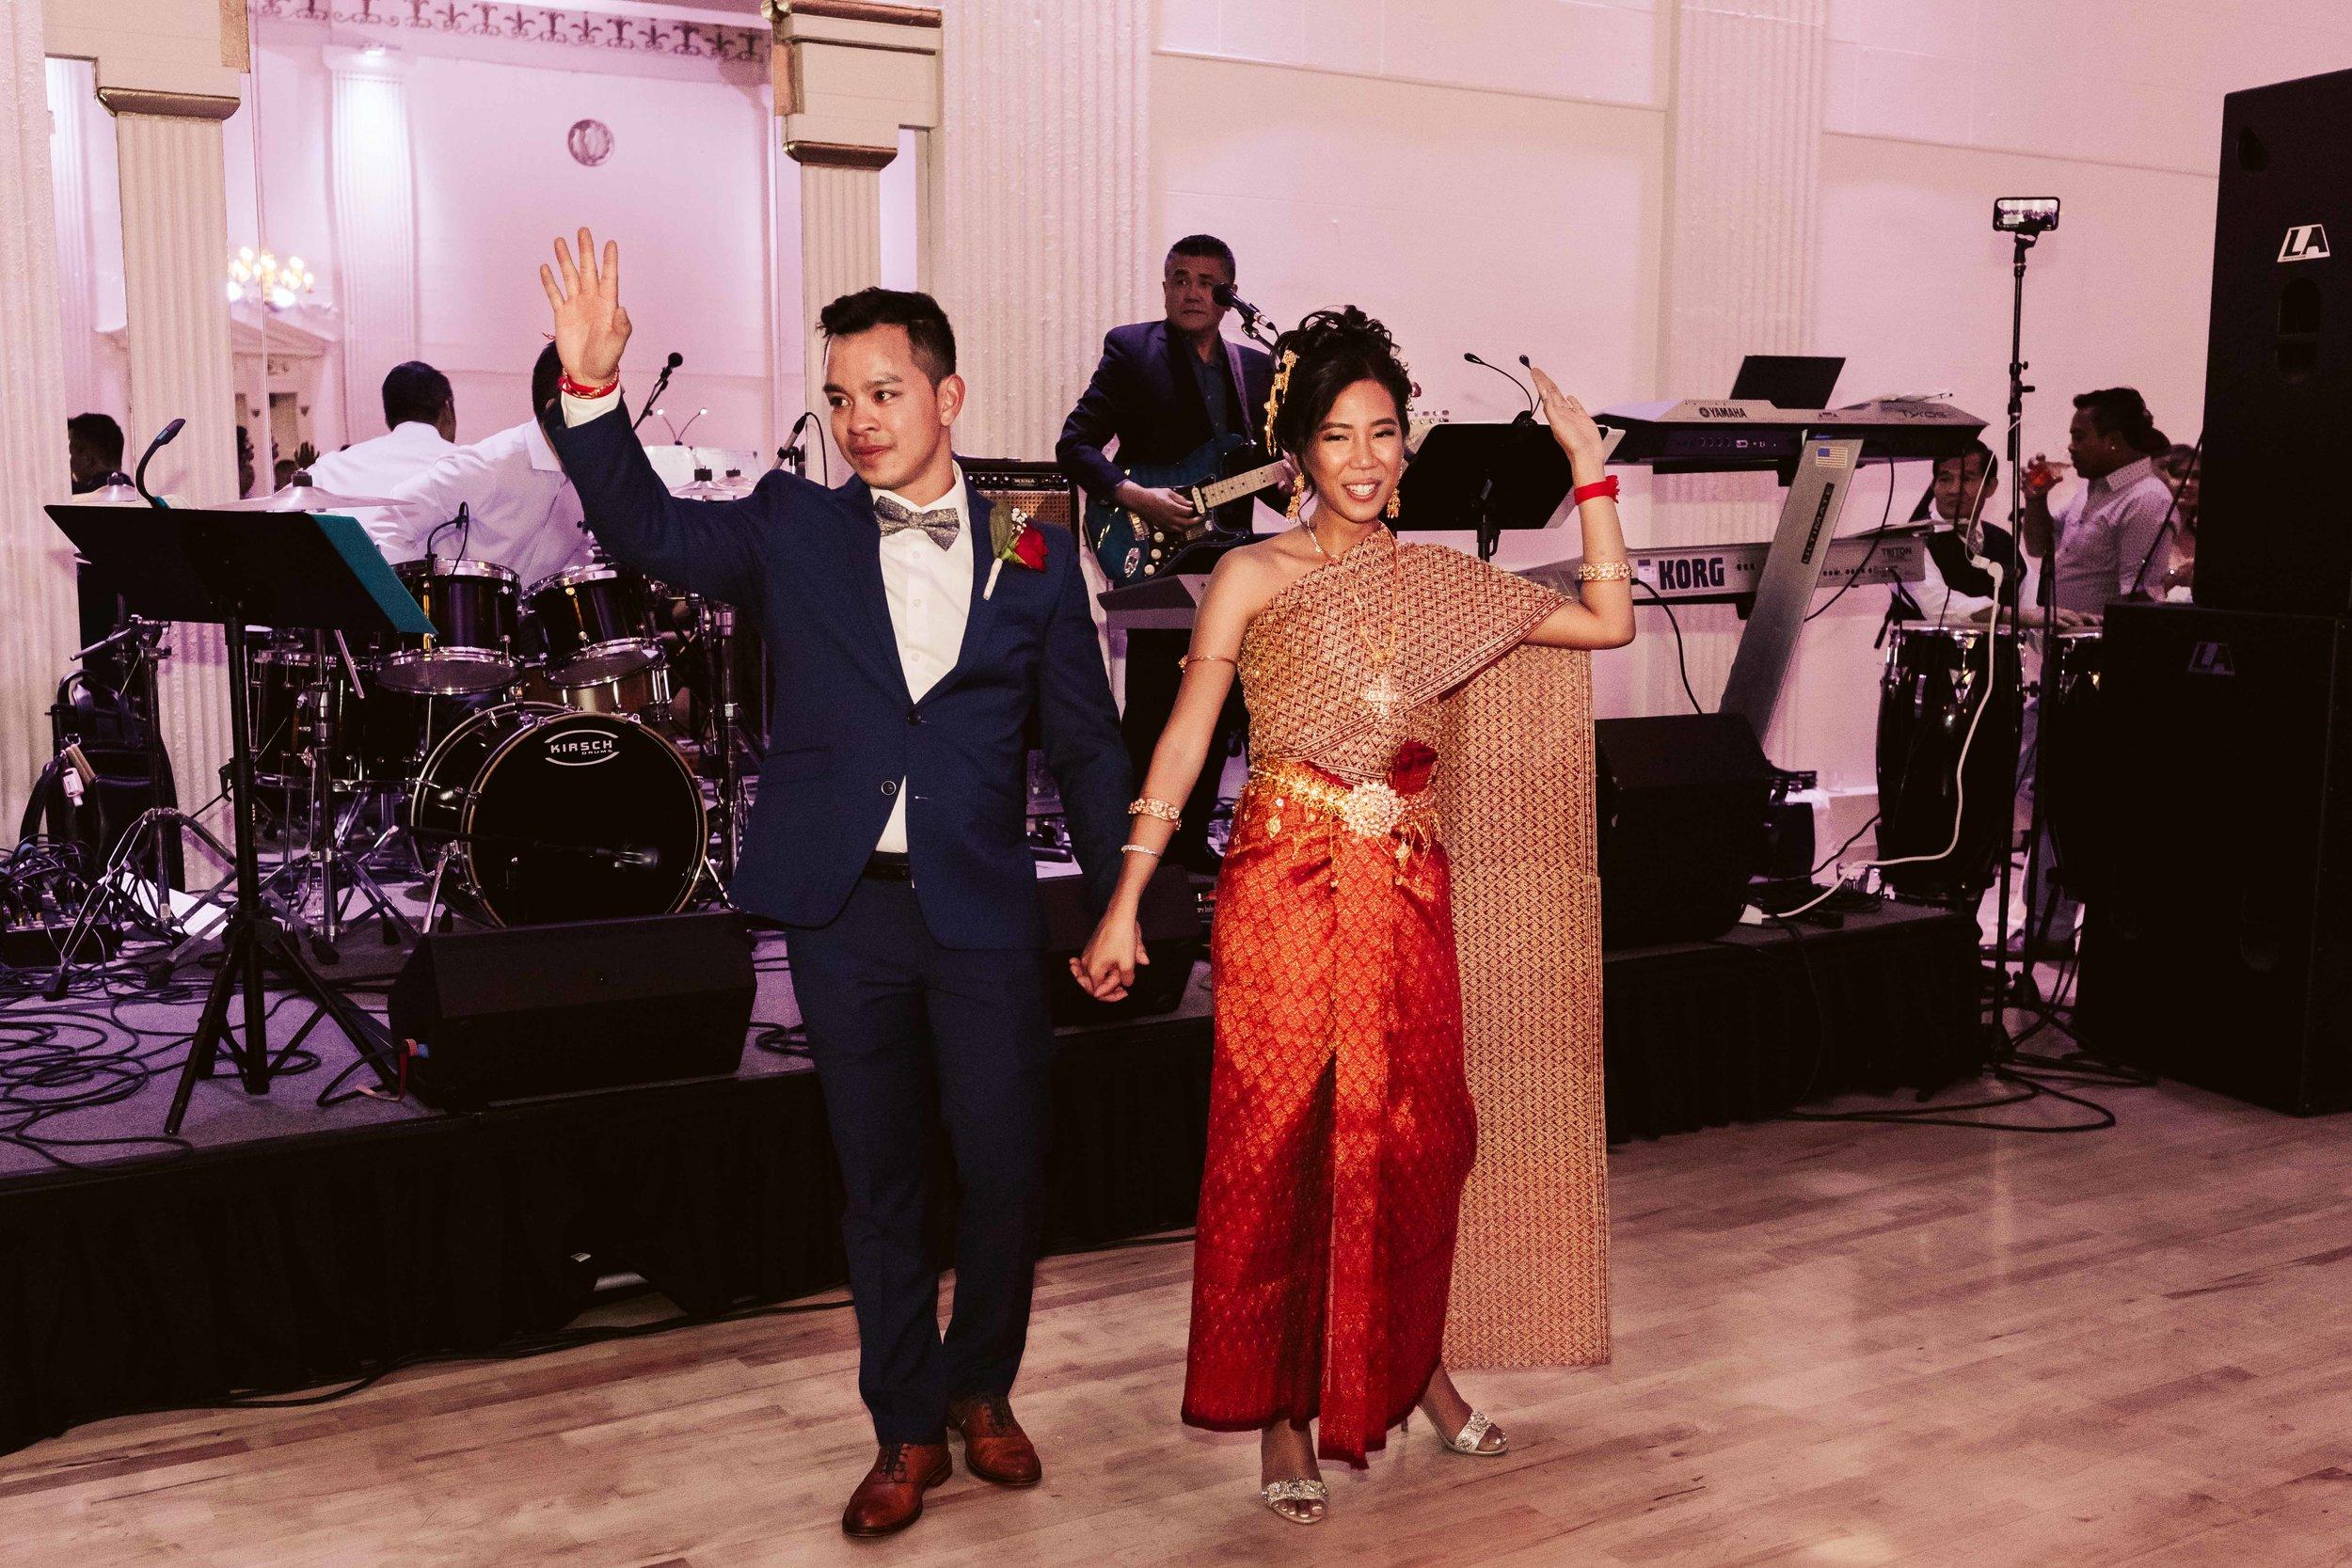 melody-ballroom-portland-wedding-110.jpg